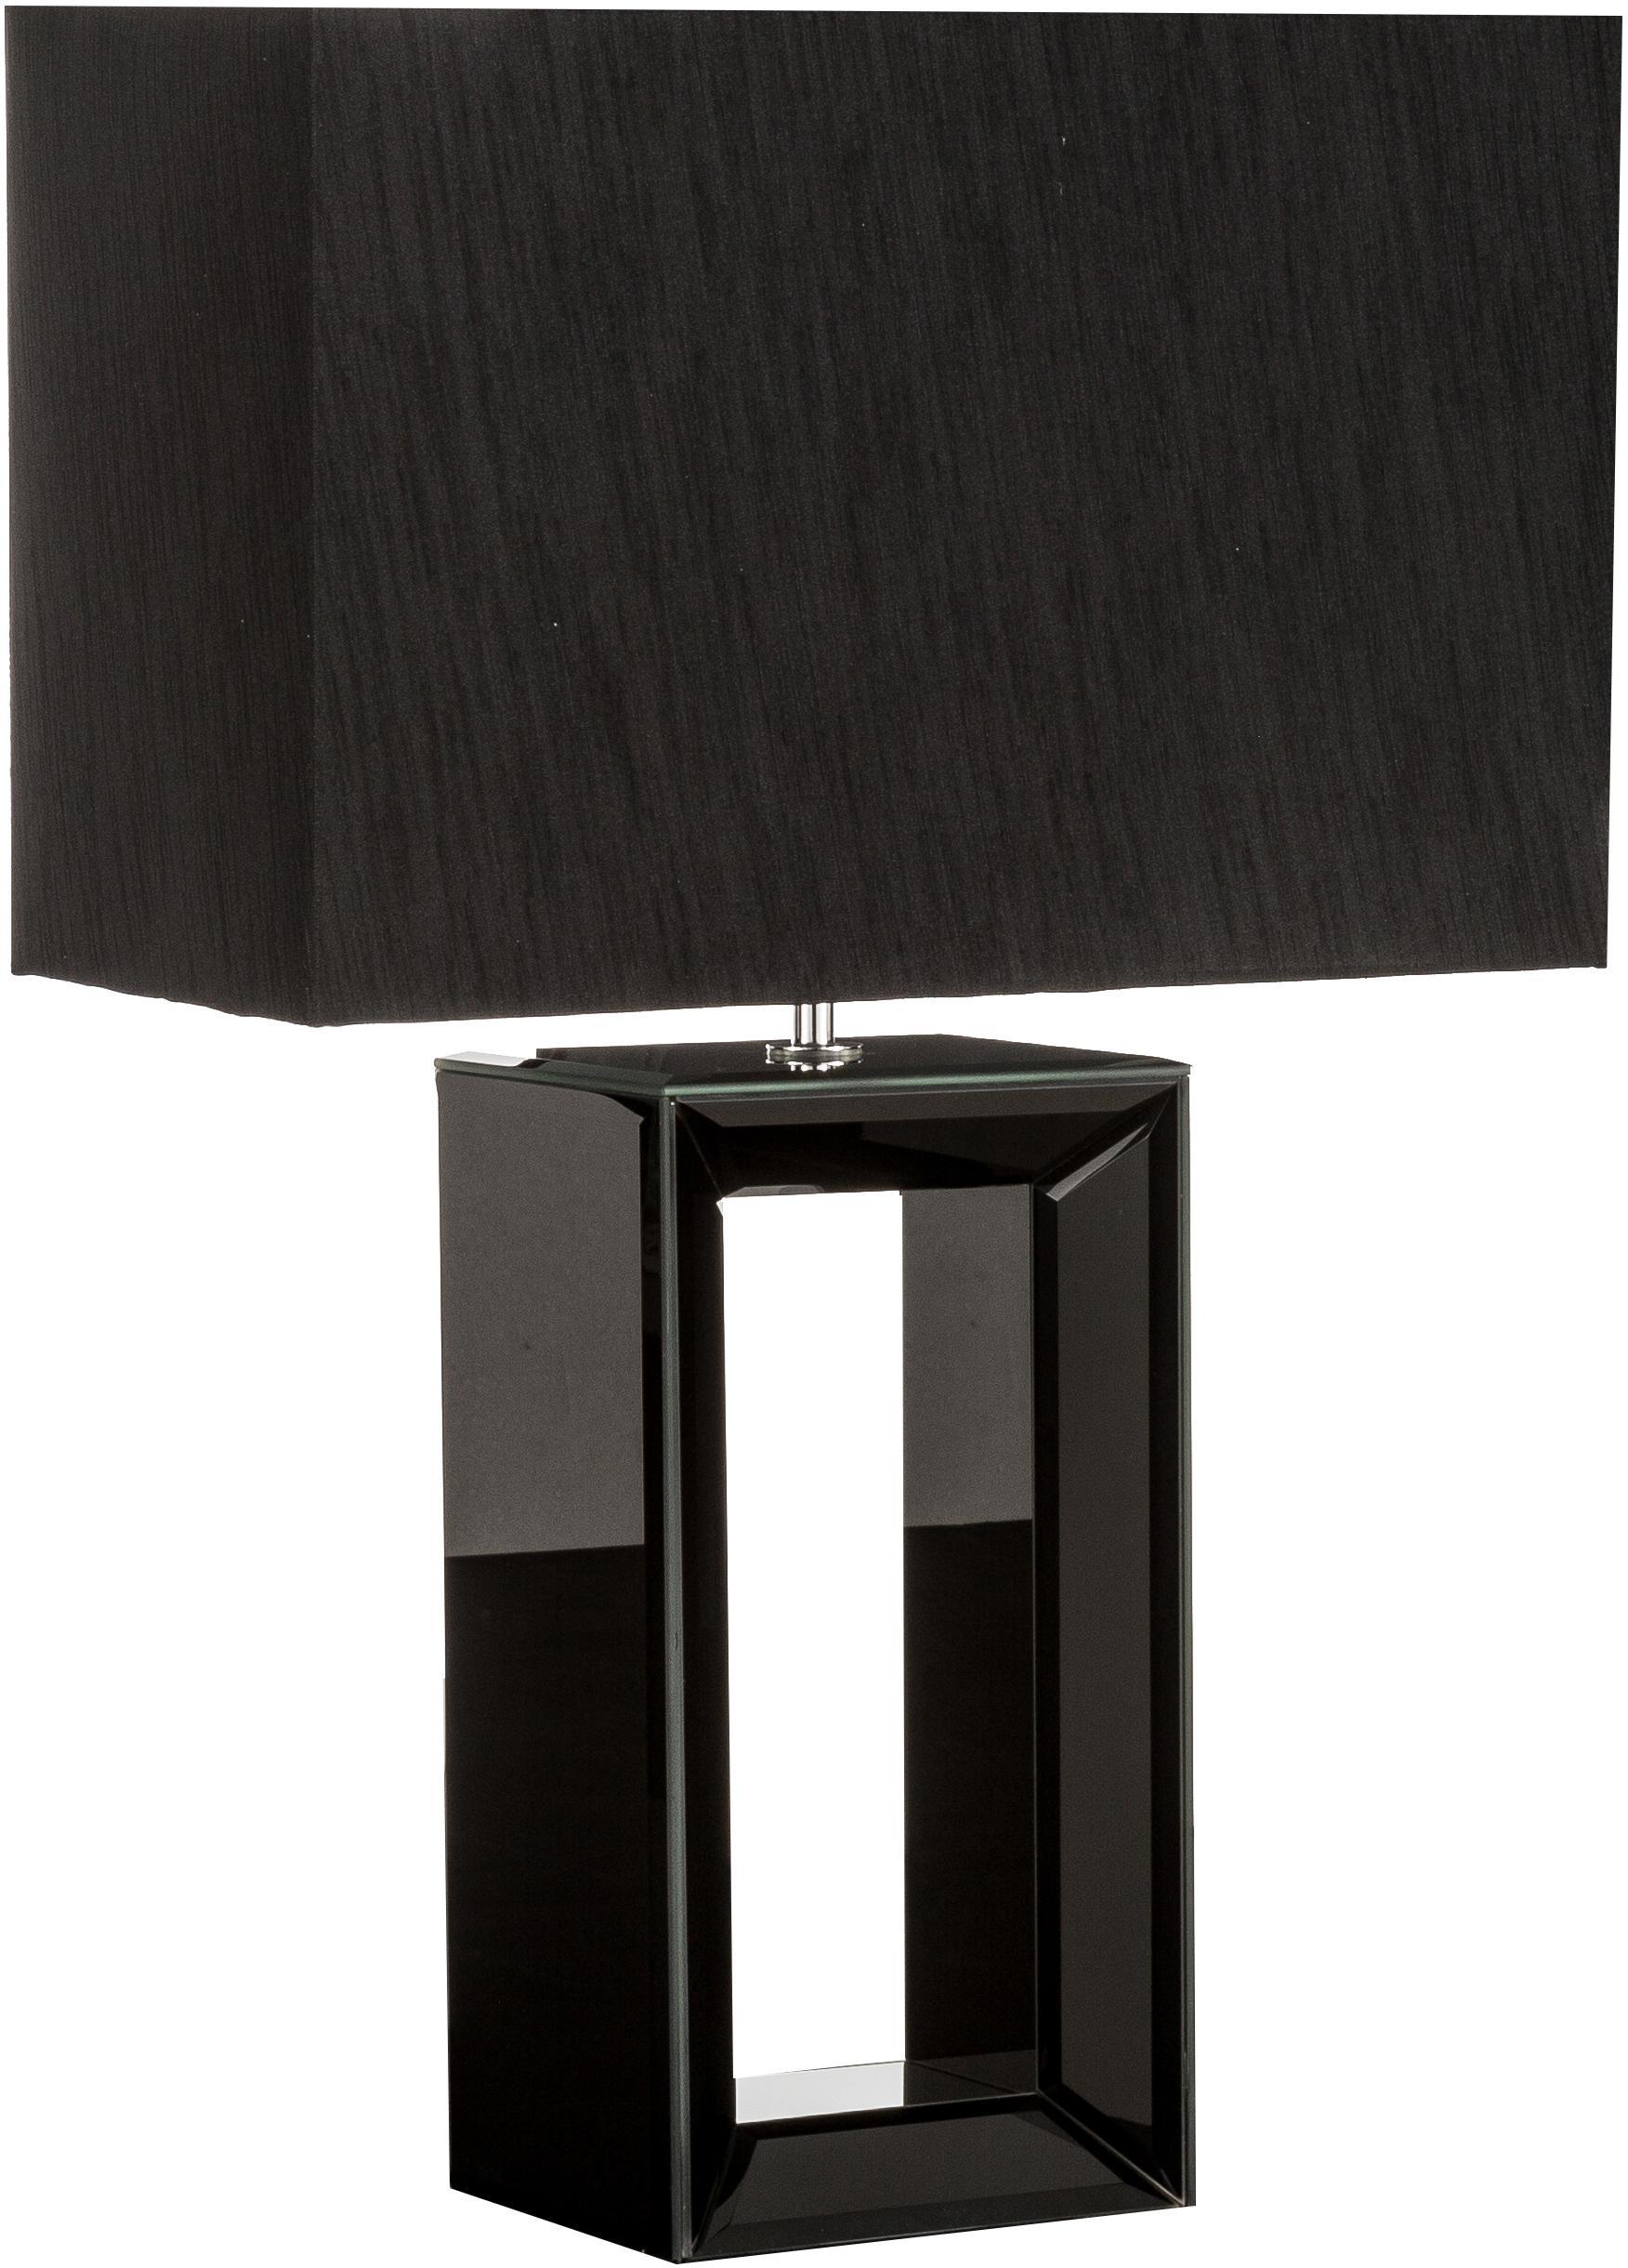 Tafellamp Serafina van gelakt spiegelglas, Lampvoet: spiegelglas, Lampenkap: textiel, Lampvoet: zwart, gespiegeld. Lampenkap: zwart, 38 x 58 cm